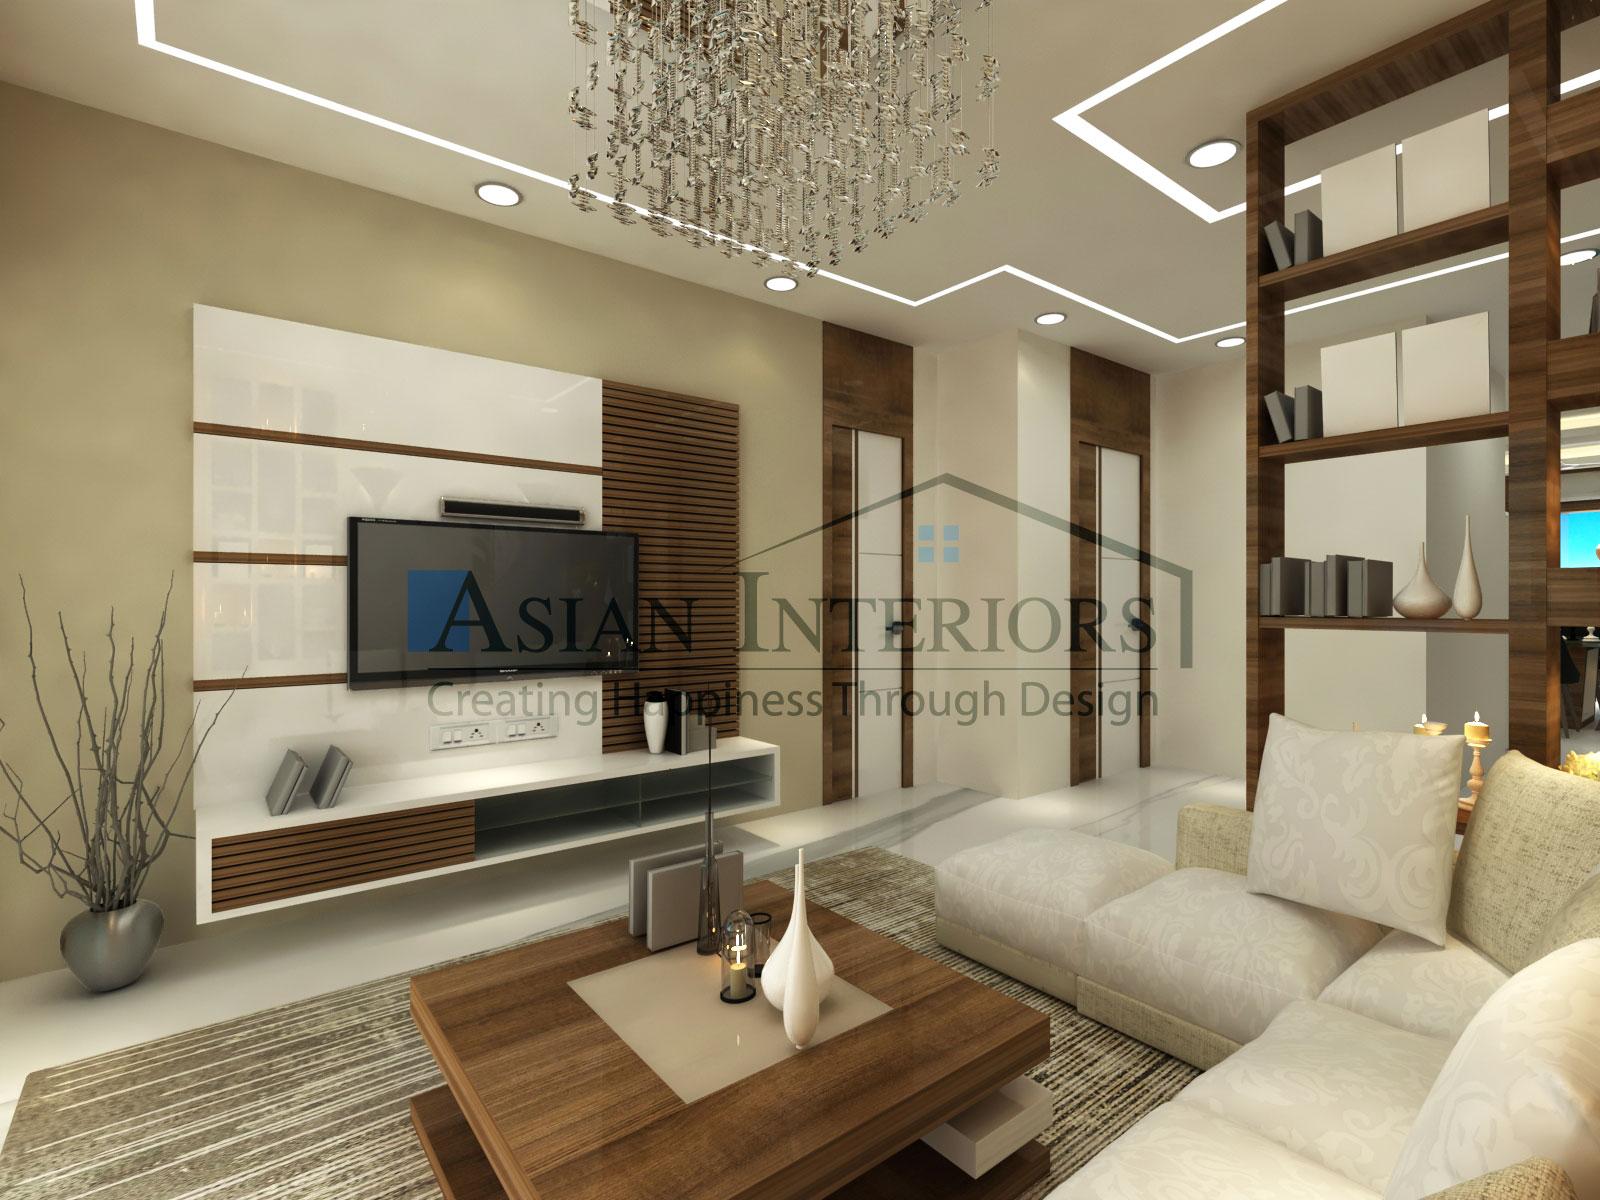 Asian-Interiors-DrawingRoom9